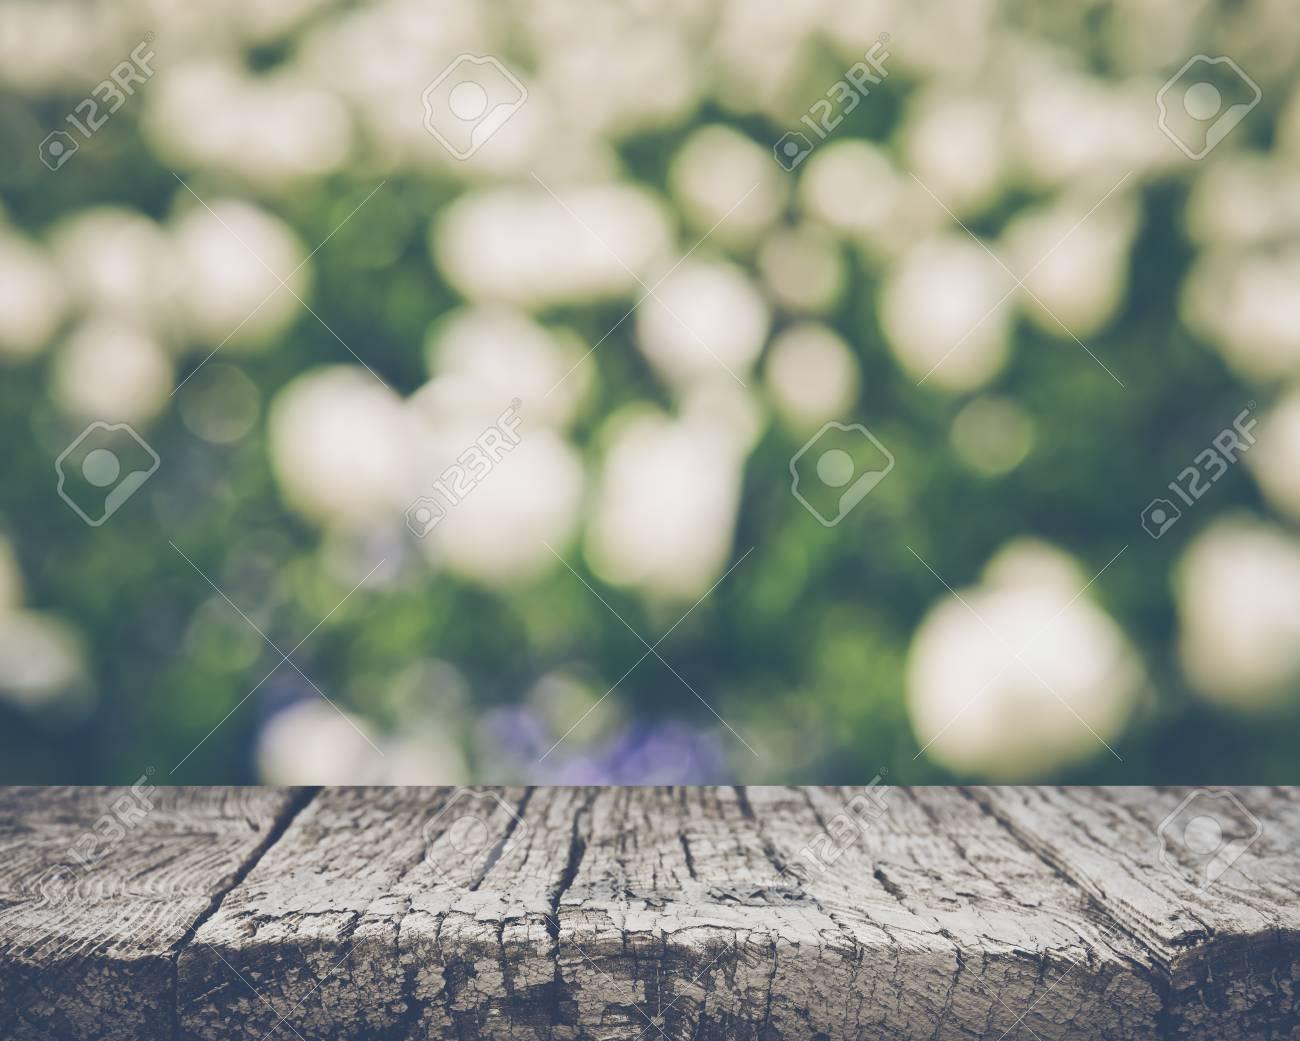 White Tulip Flowers Blurred - 55007558